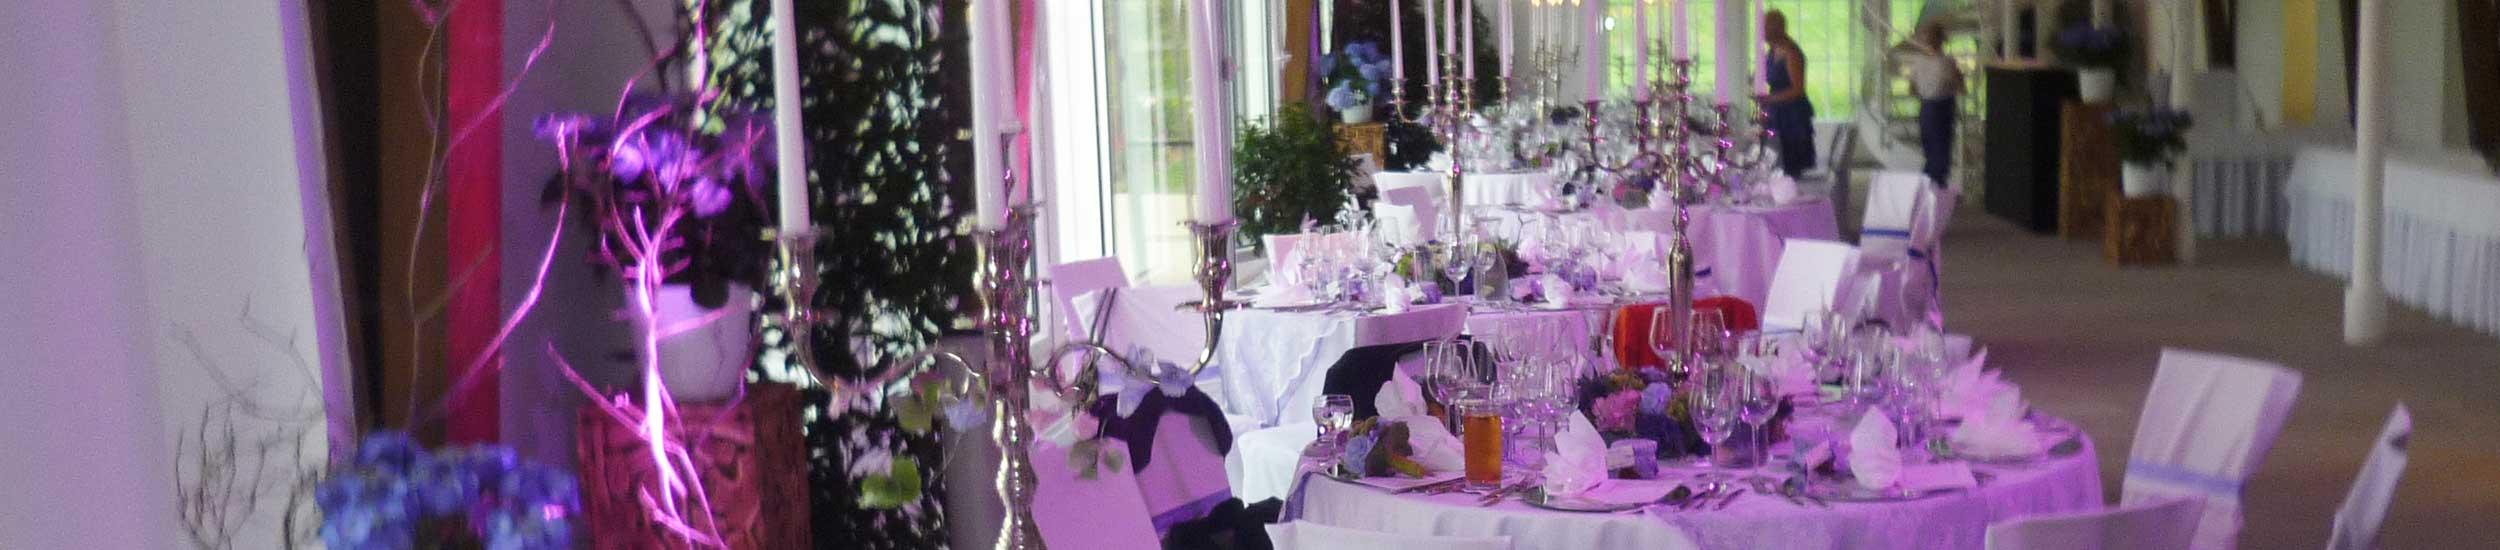 Hochzeiten-Partys-Catering-Events